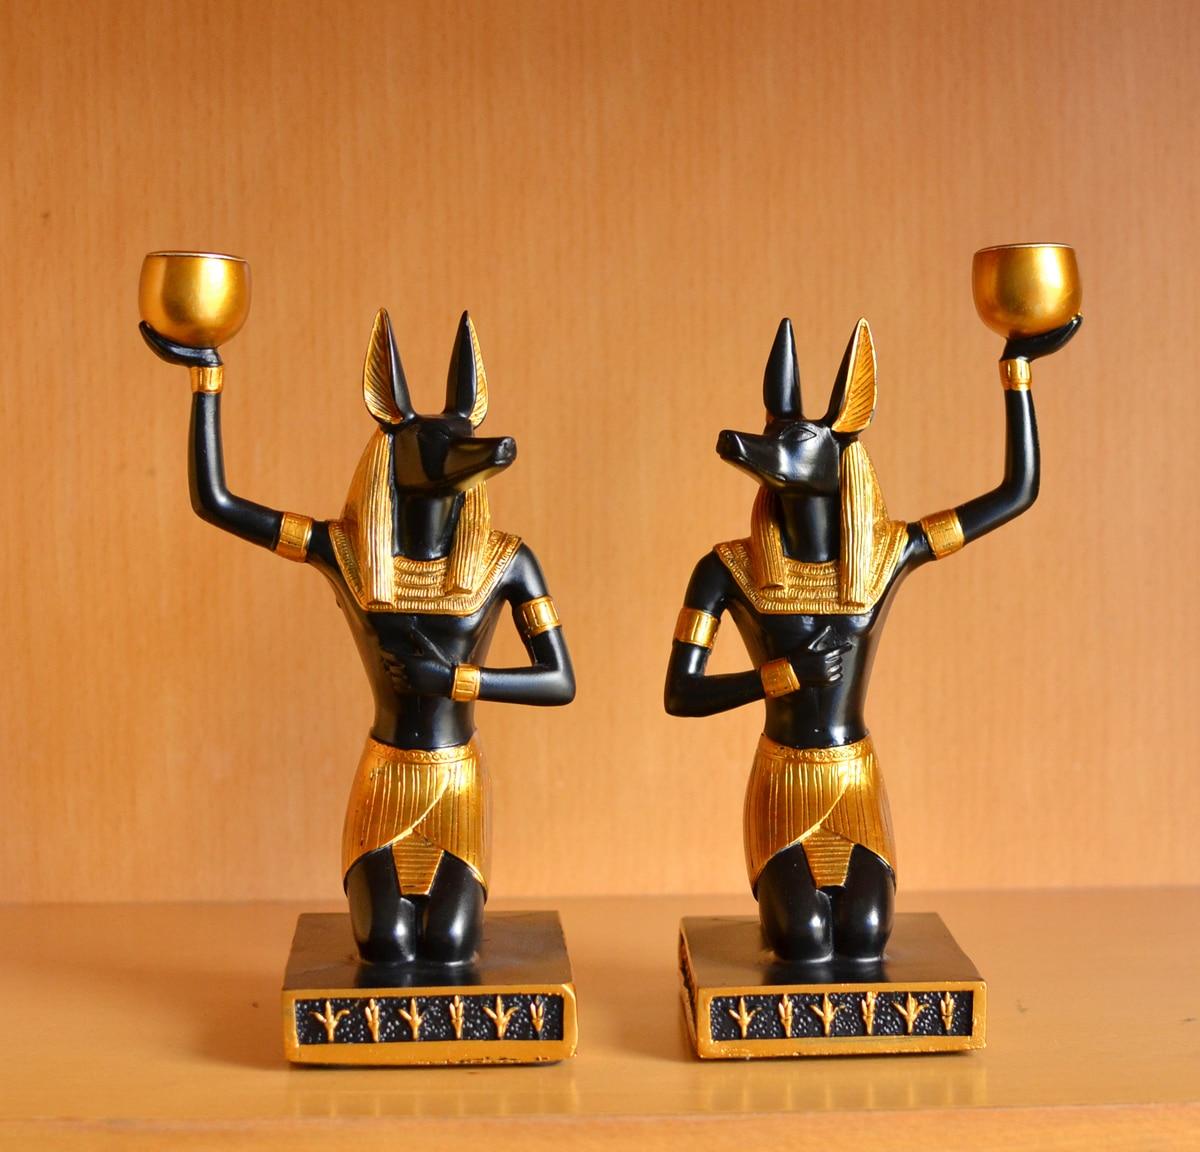 Decoración de estilo egipcio perro dios Anubis figurillas escritorio creativo portavelas boda hogar adorno artesanía decoración candelabro